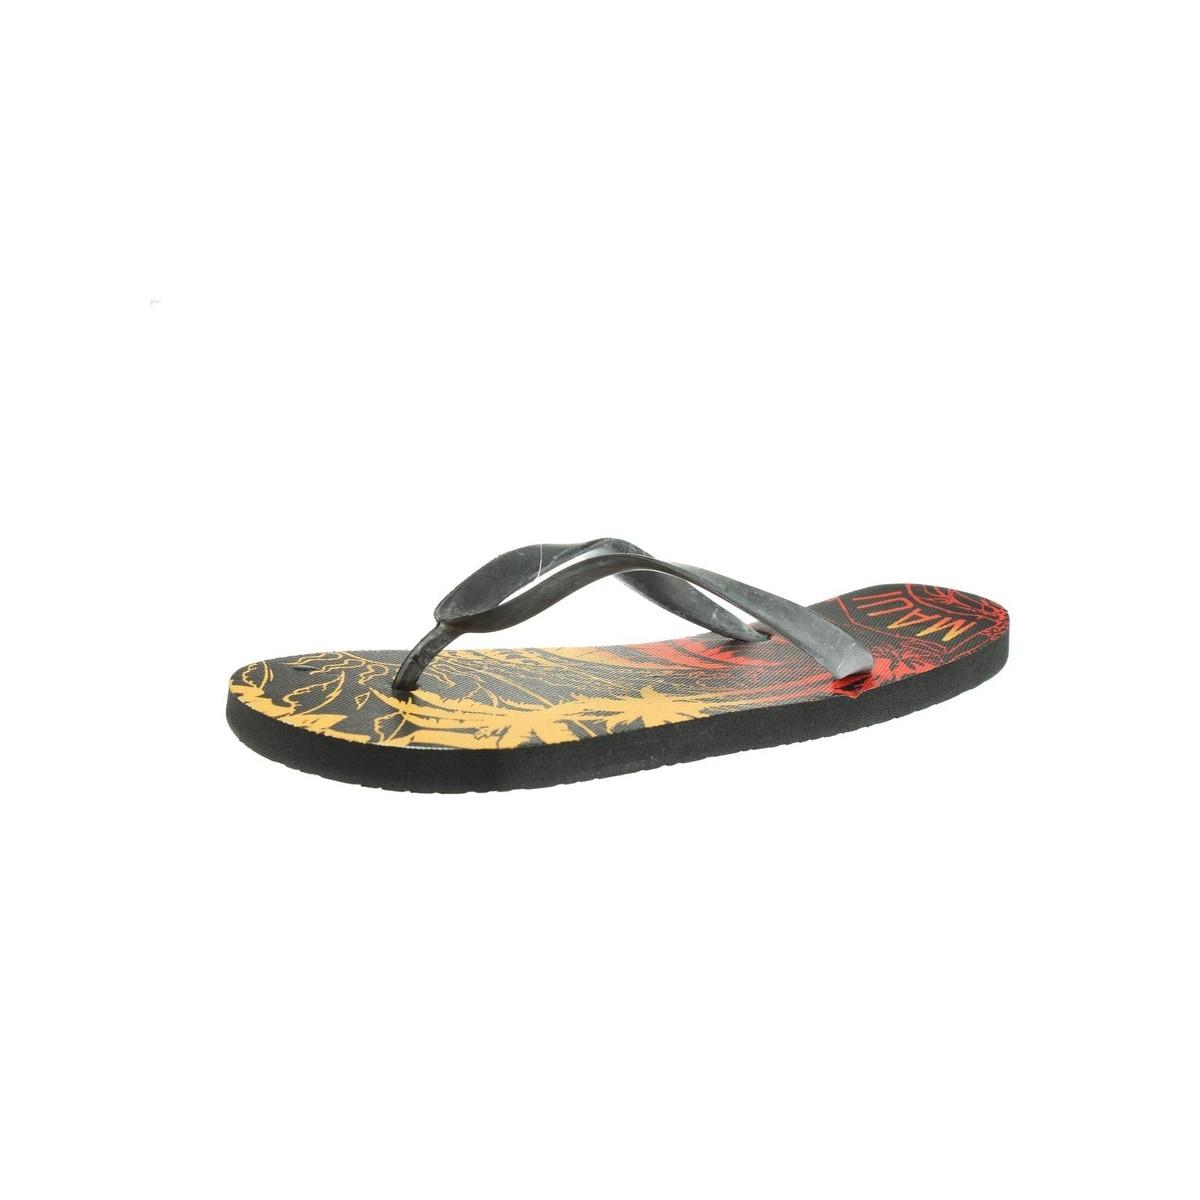 Maui and Sons Mens Flip-Flops Graphic Slide - Thumbnail 0